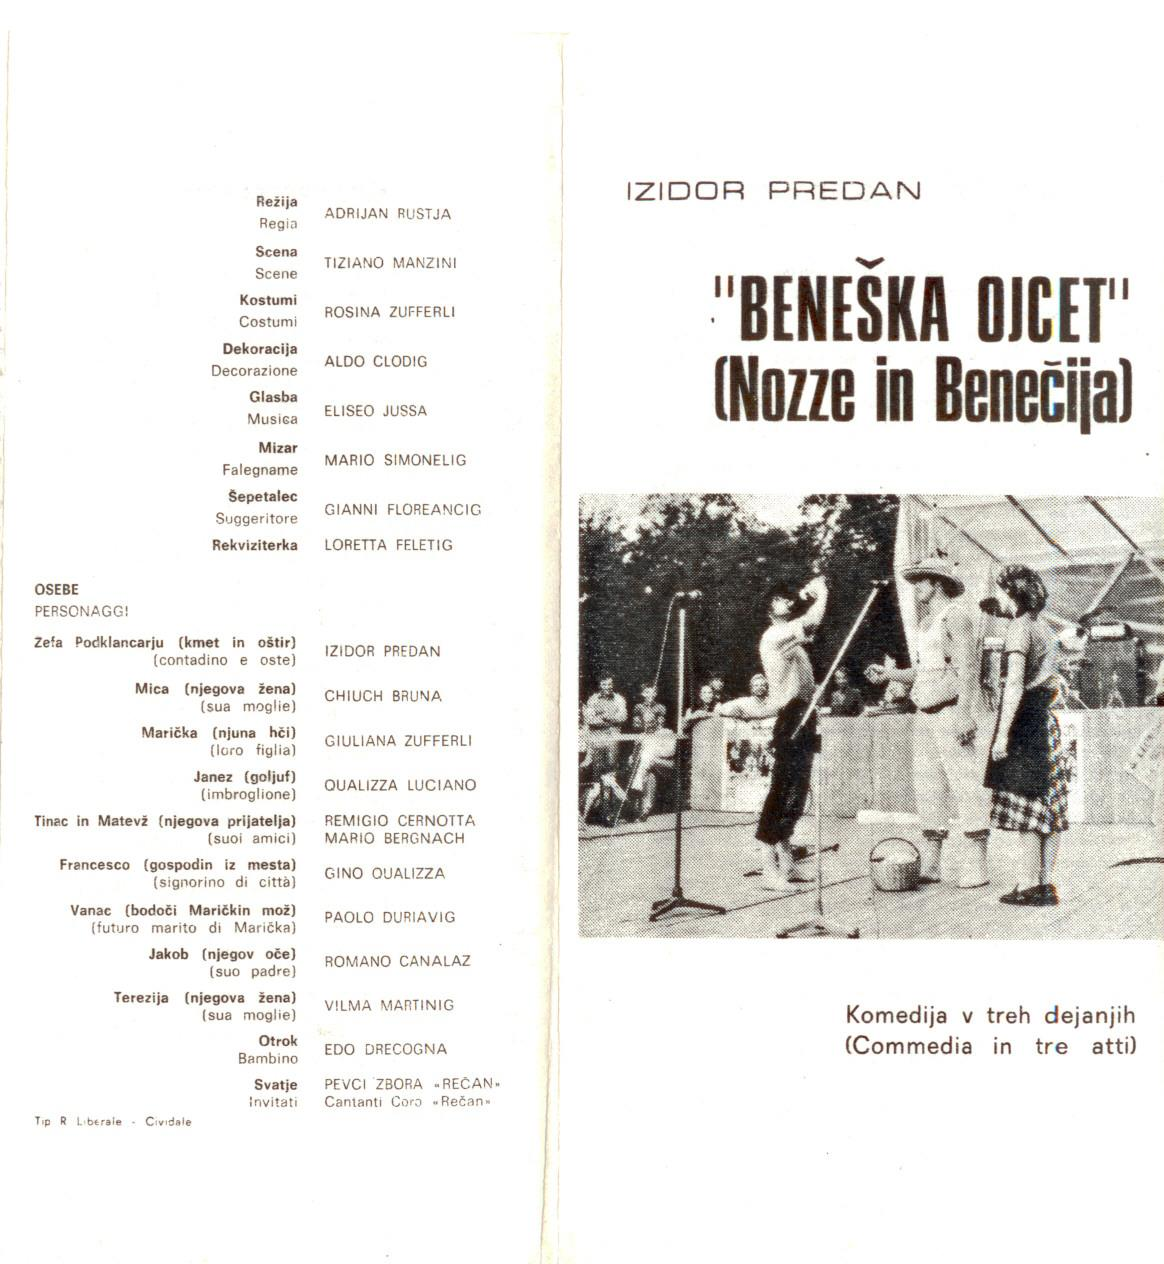 1976 - Beneska Ojcet - Vabilo 1